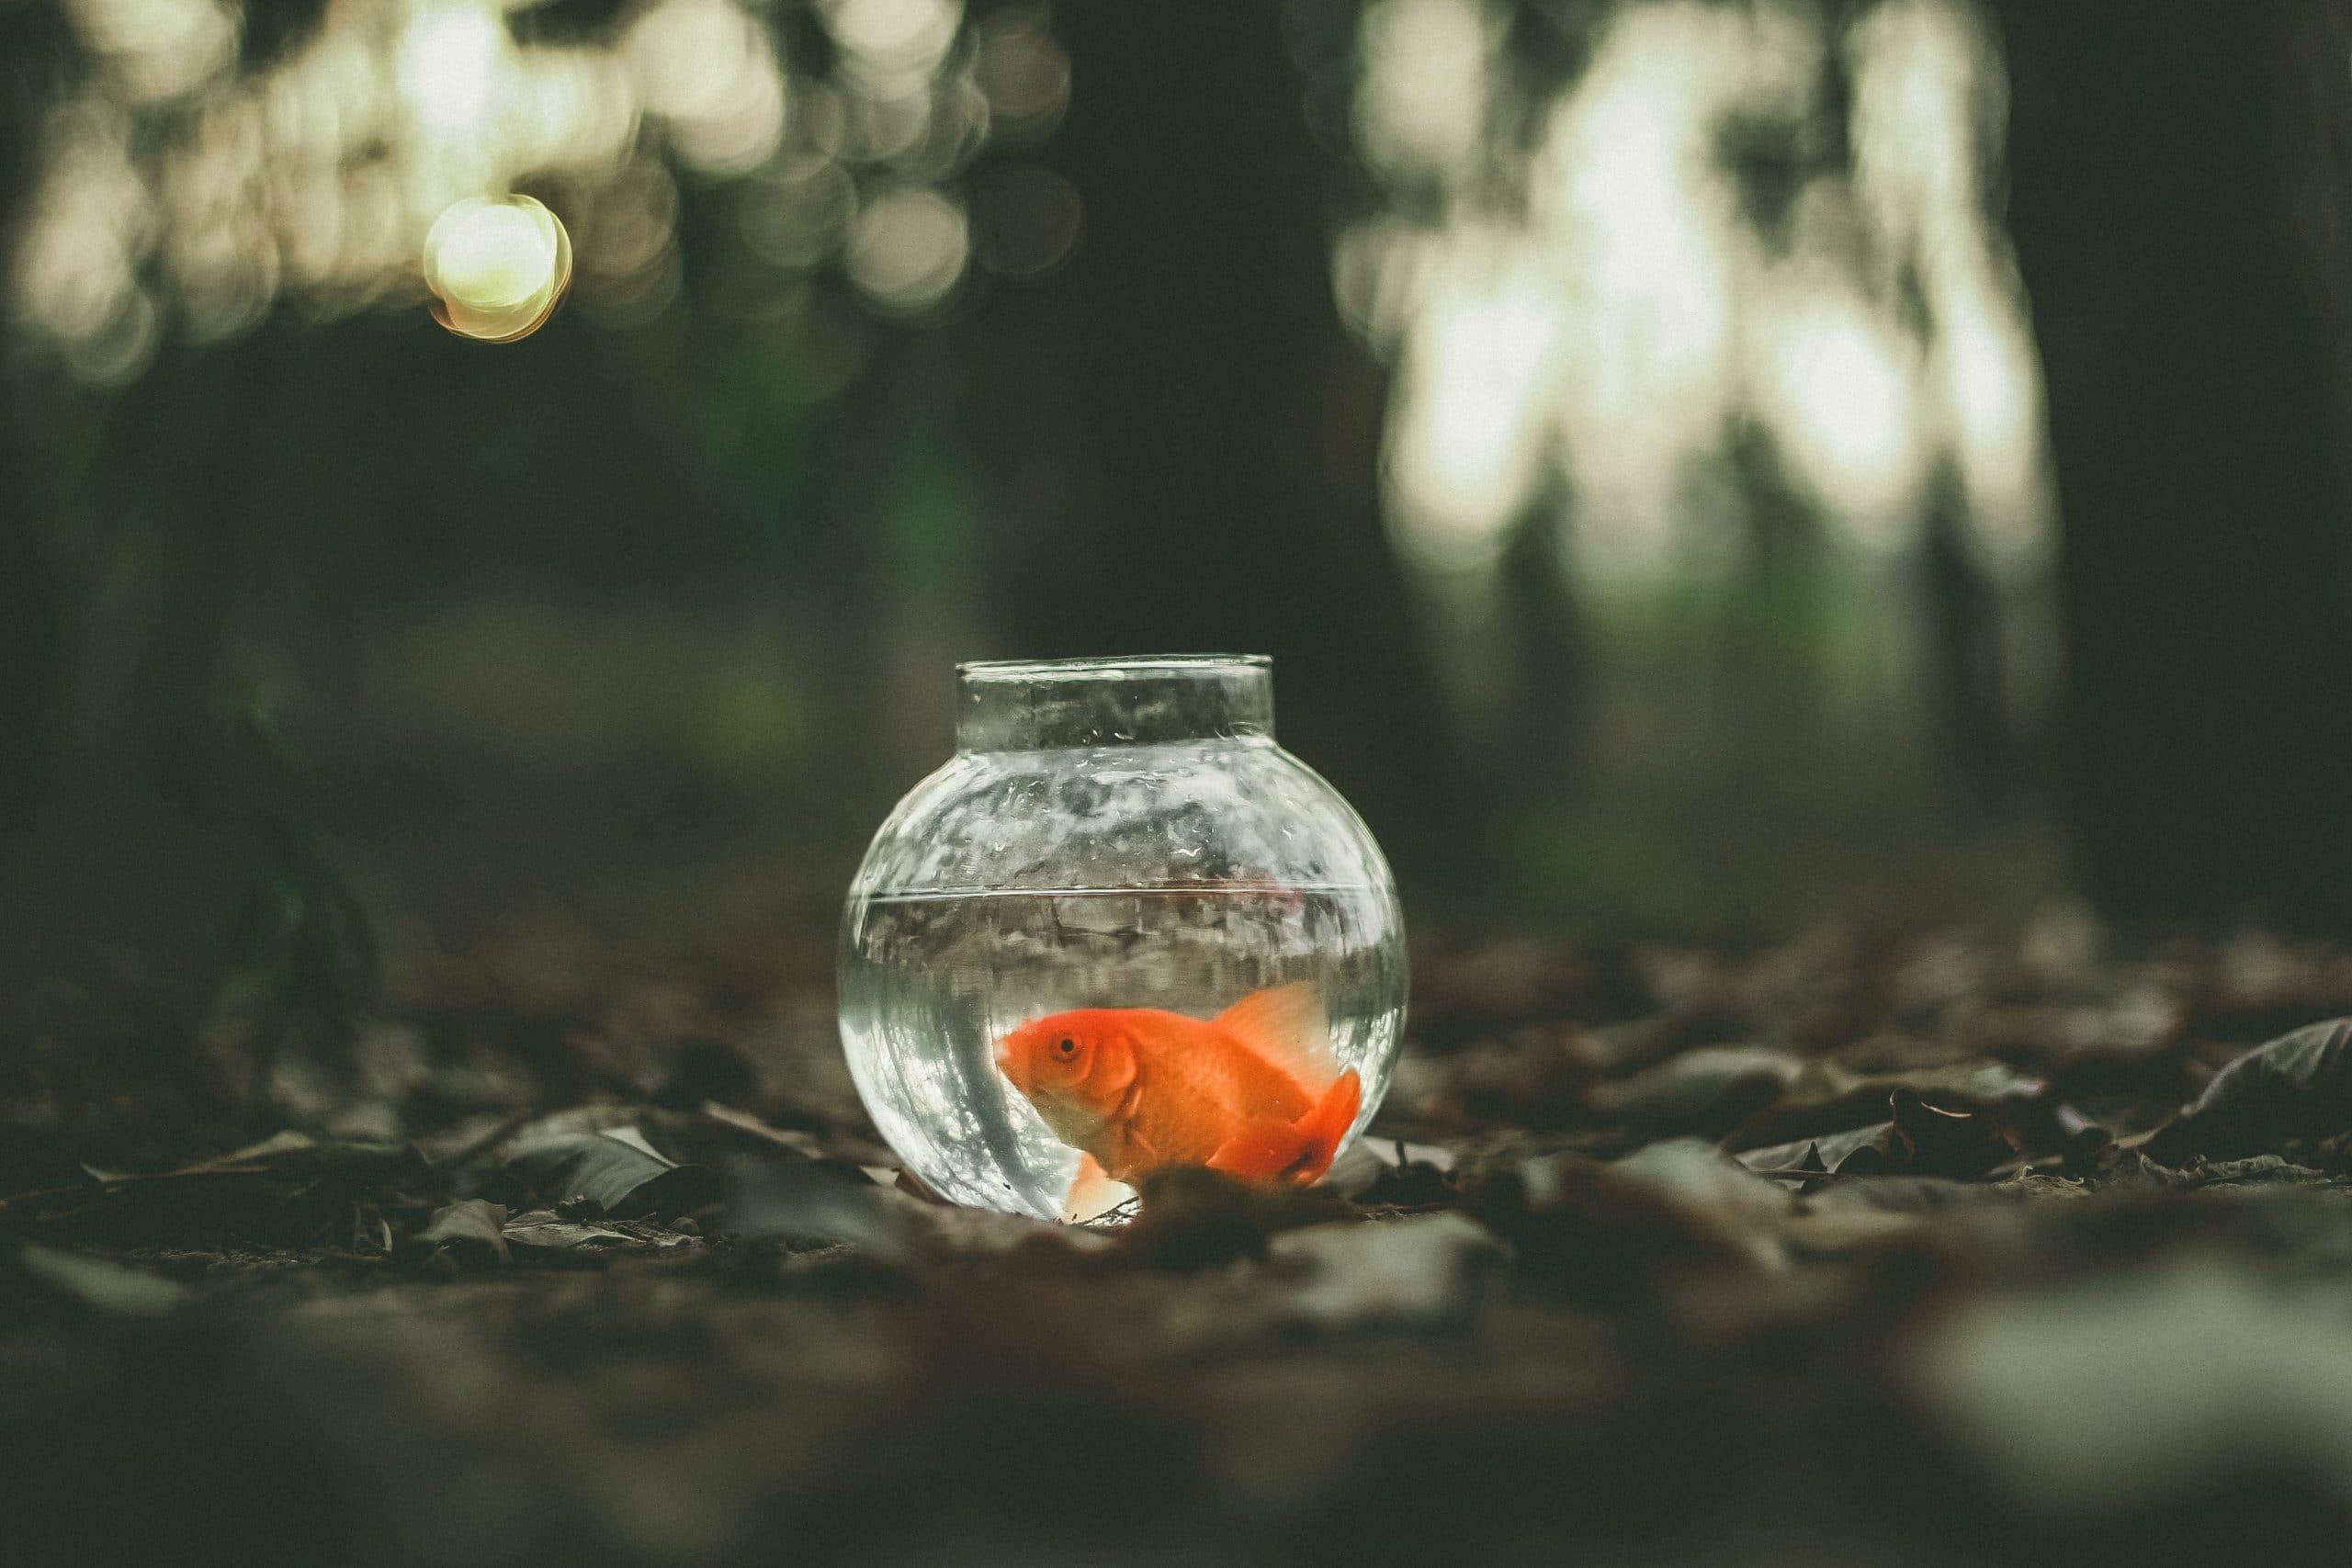 vis kleine kom grond blaadjes vissenkom goudvis